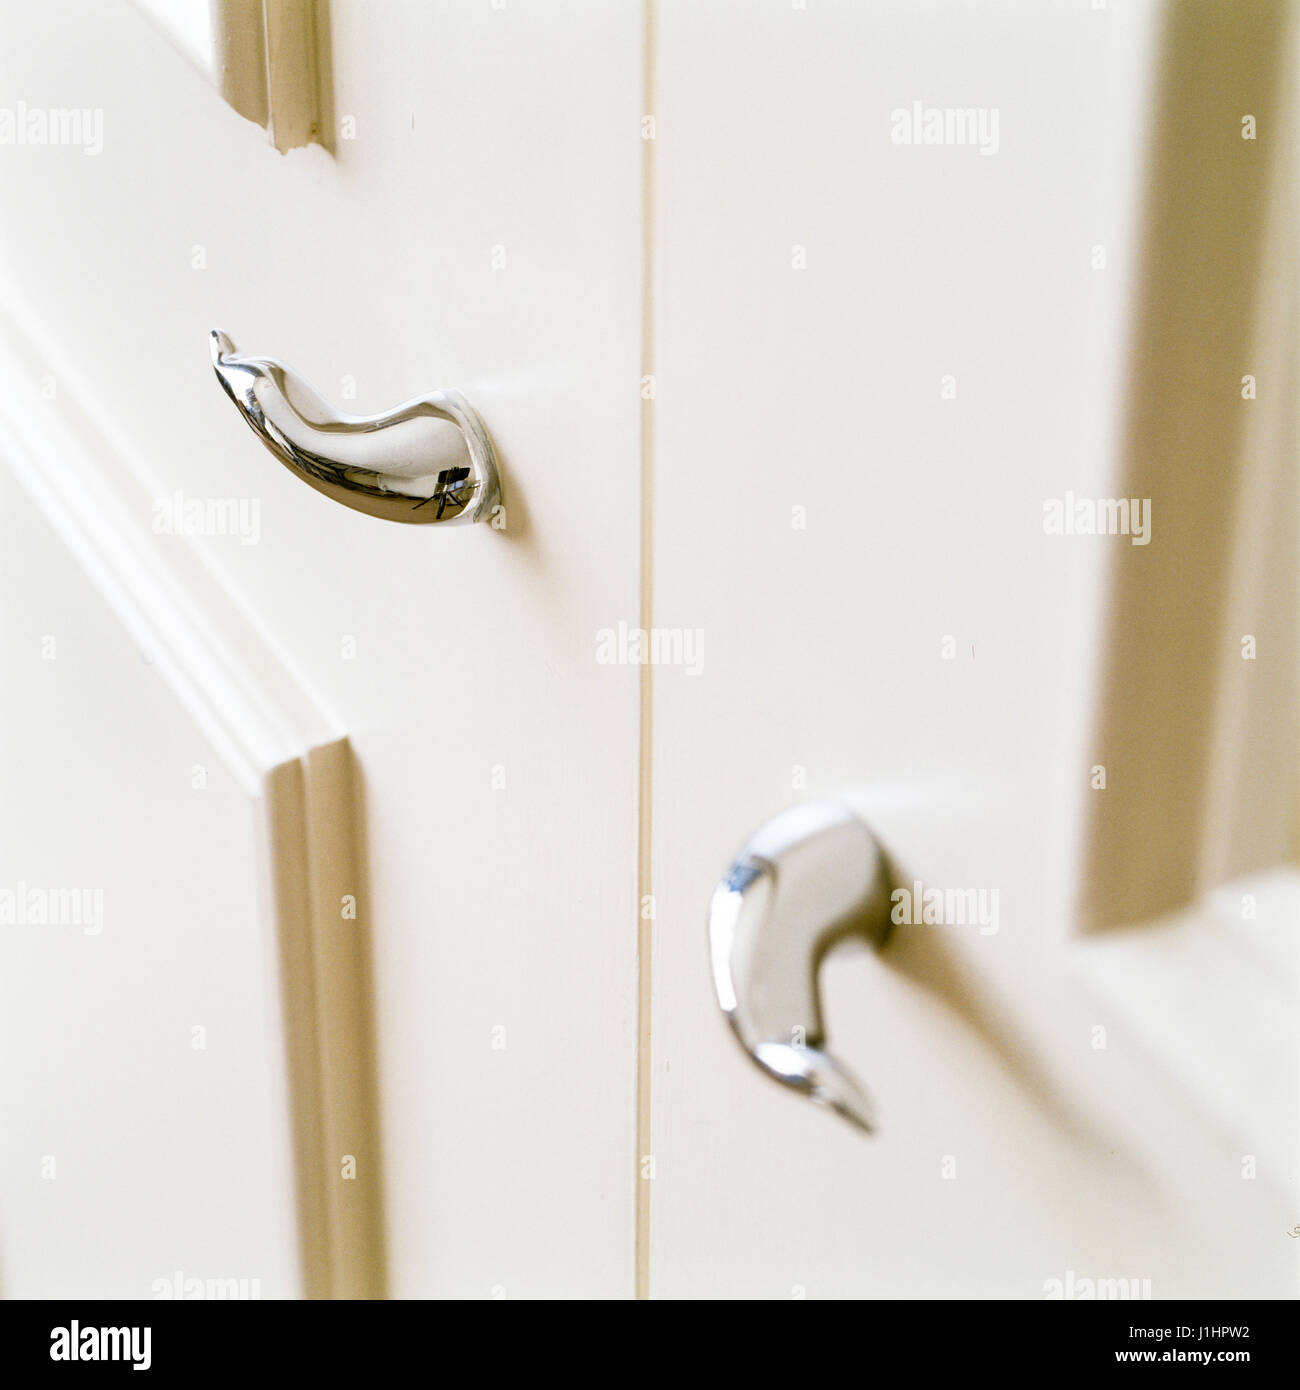 Contemporary door handle. - Stock Image